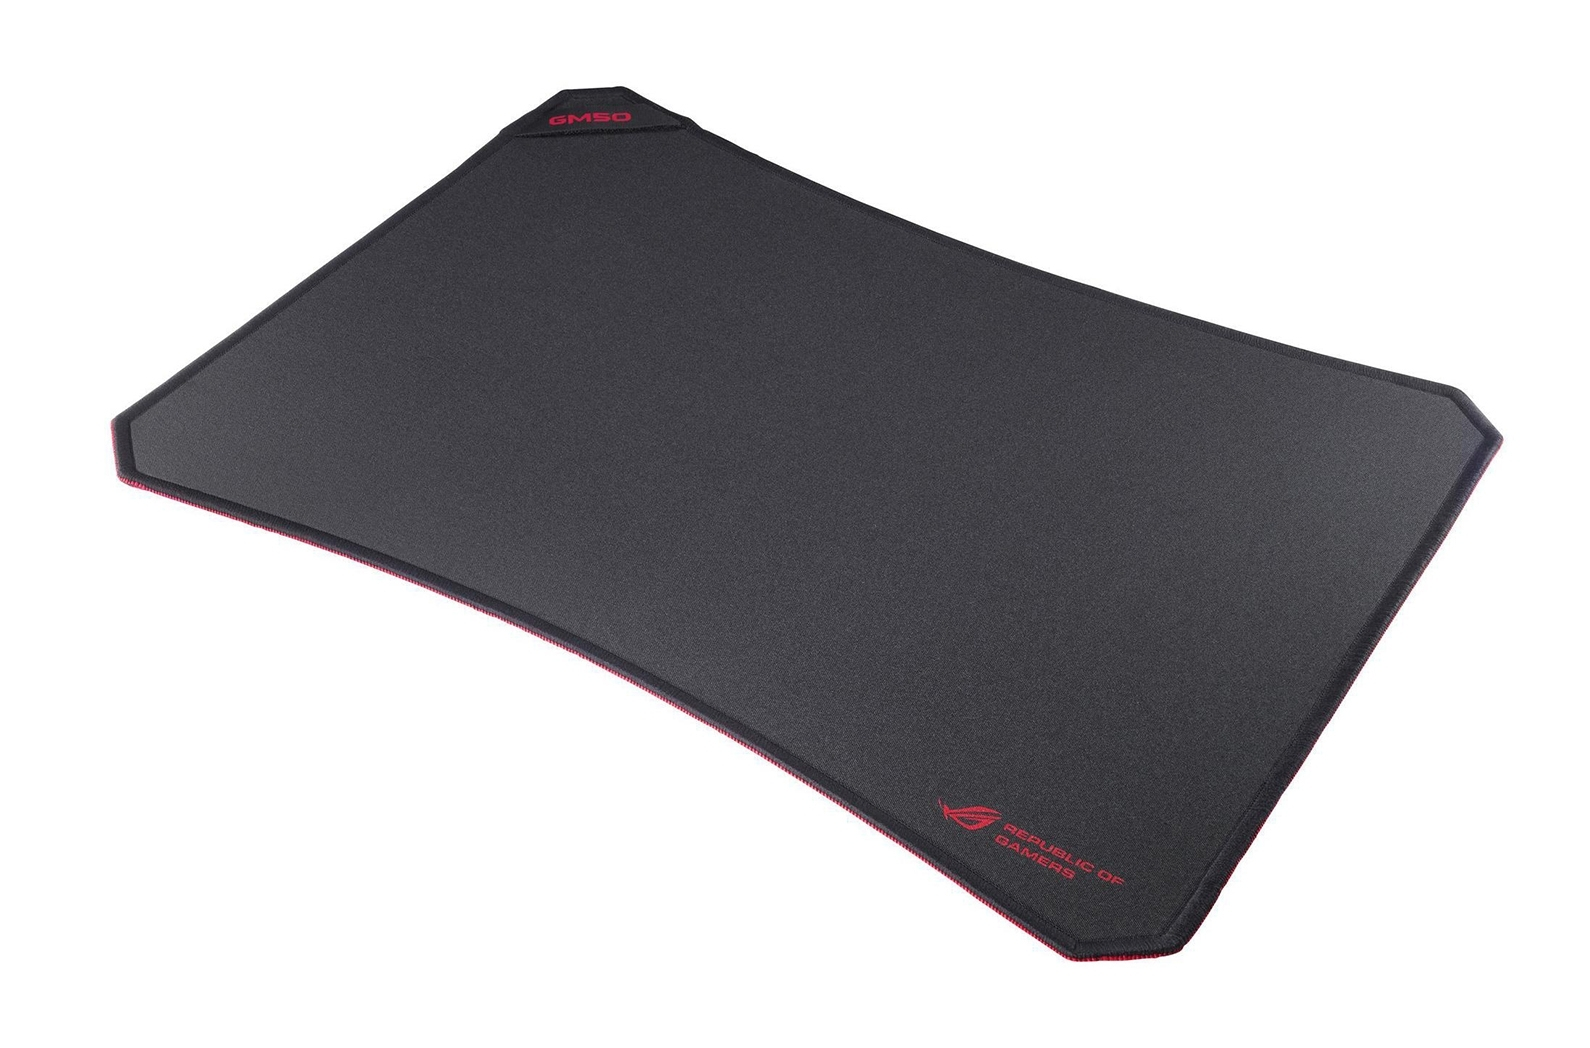 все цены на Коврик для мыши ASUS GM50 Mousepad Speed, Black